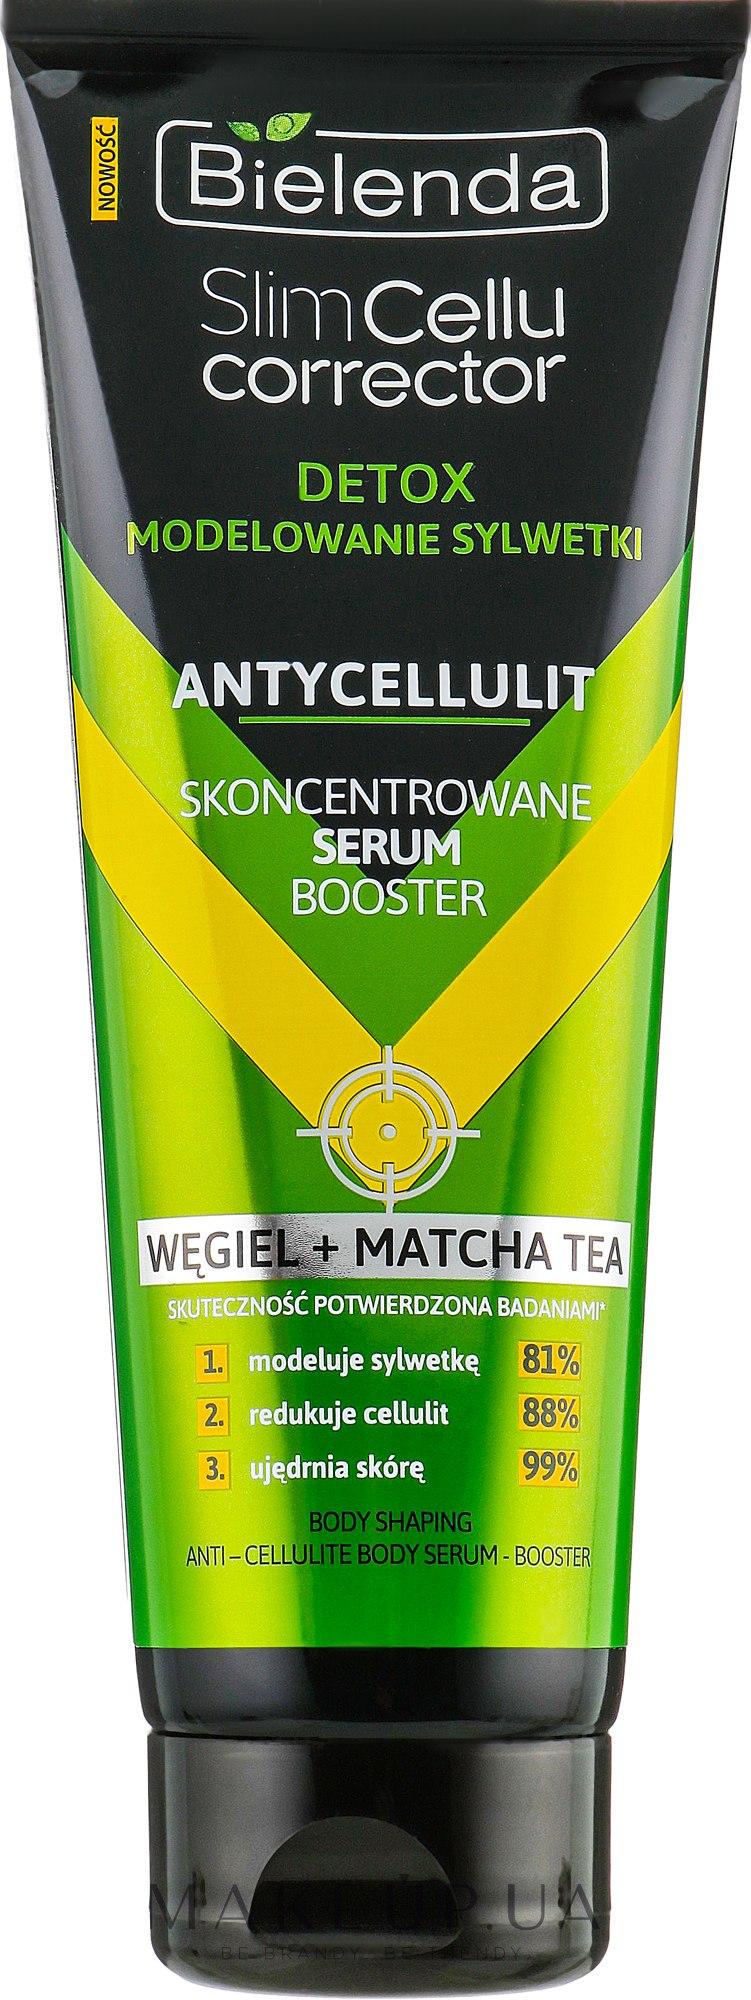 Антицелюлітна сироватка - Bielenda Slim Cellu Corrector Concentrated Serum Booster Carbon+Matcha Tea — фото 250ml